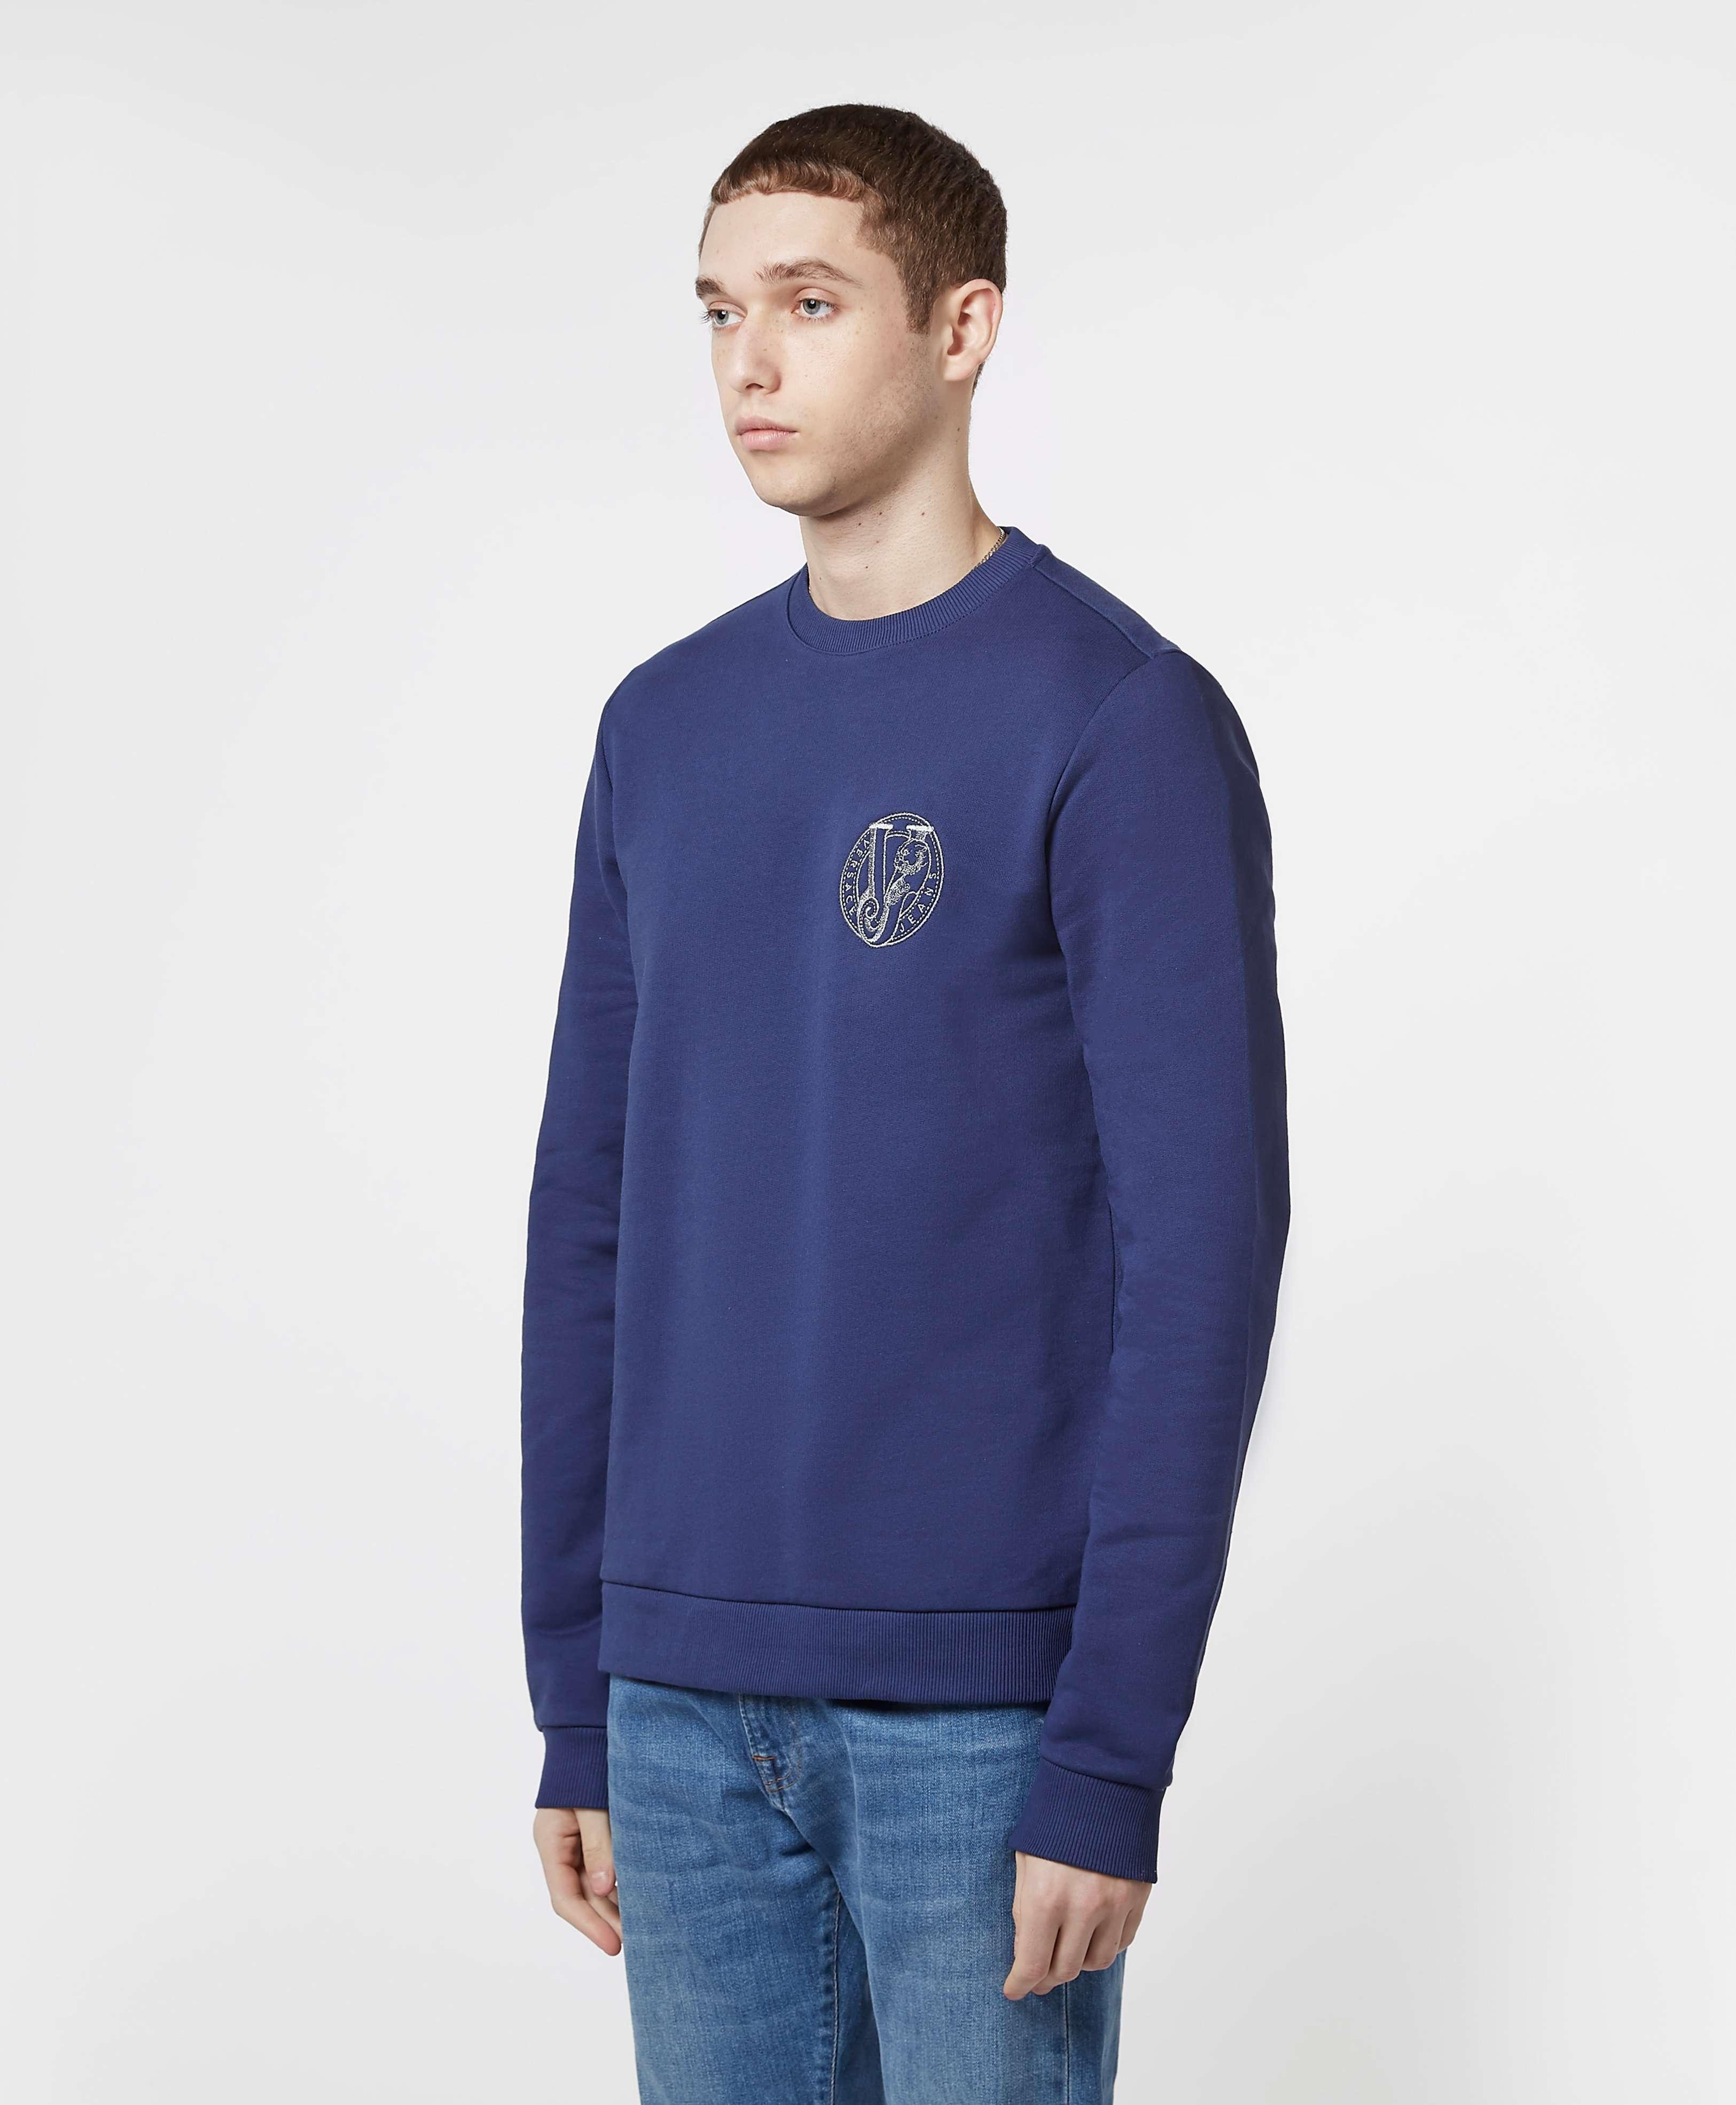 Versace Jeans Basic Sweatshirt